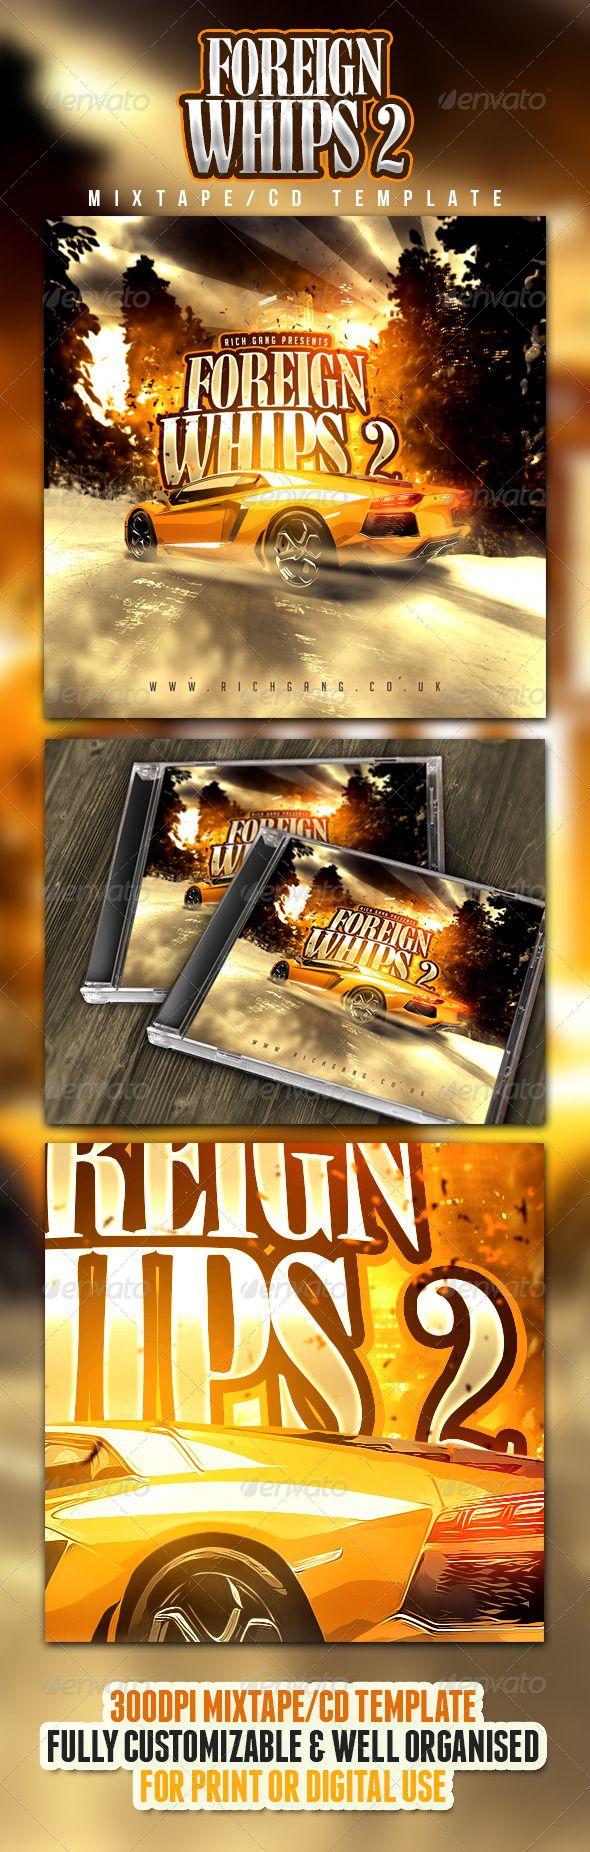 Rich Gang Hip Hop / Rap Mixtape CD Cover — Photoshop PSD #artist #mixtape • Available here → https://graphicriver.net/item/rich-gang-hip-hop-rap-mixtape-cd-cover/4860098?ref=pxcr